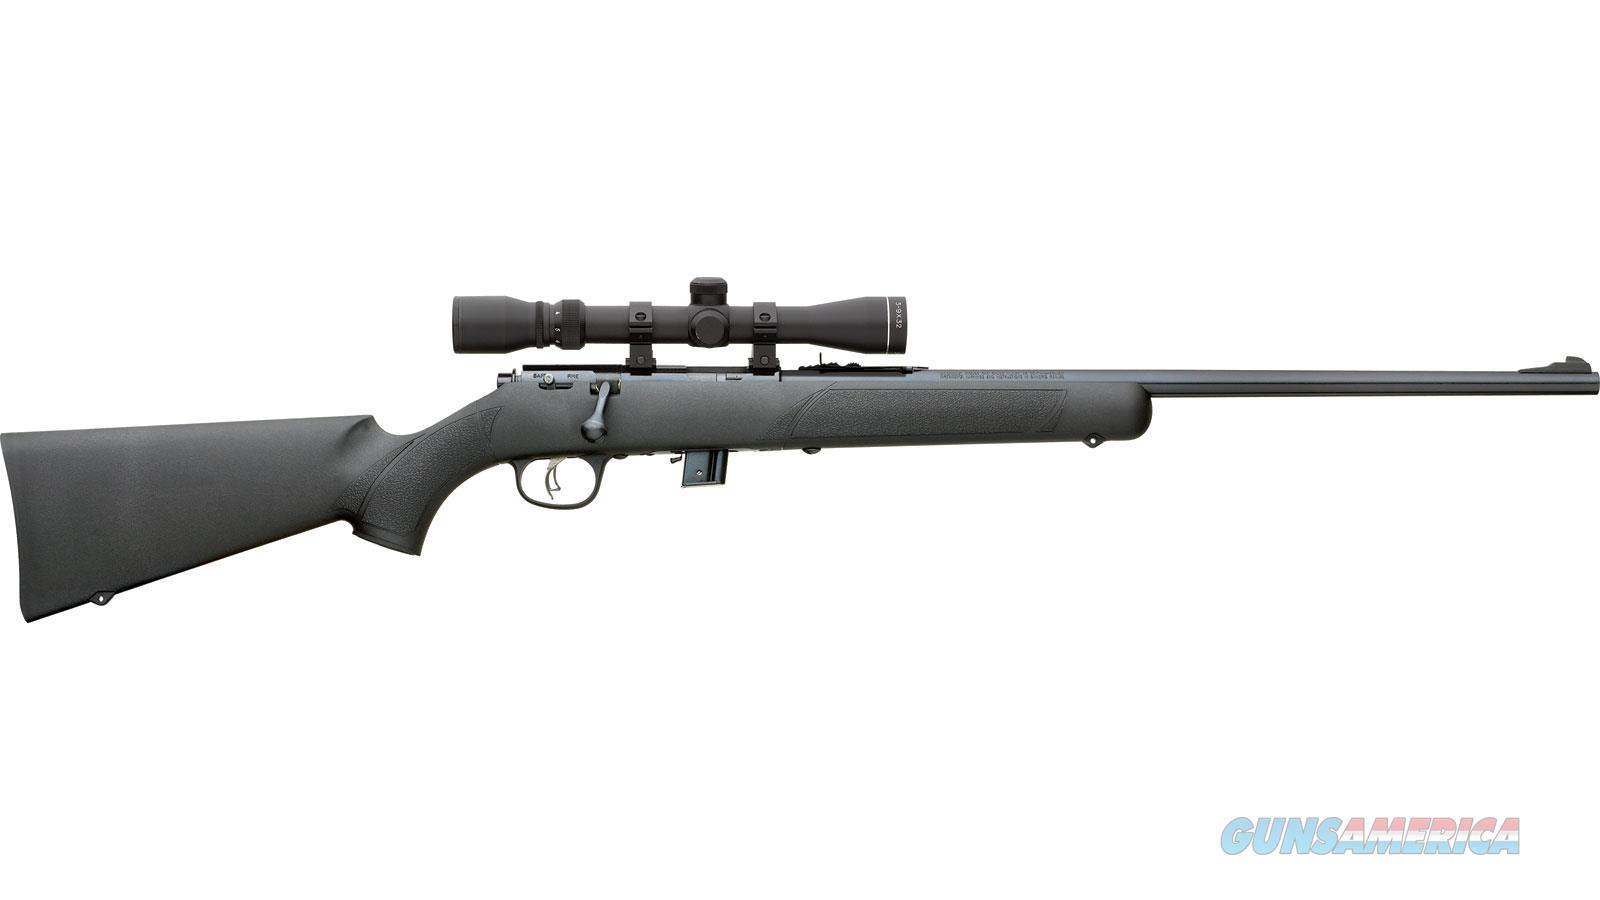 Remington Xt-22Ro 22Lr 22 Blk Syn 3-9X32 Pkg 7Rd 70778  Guns > Rifles > MN Misc Rifles